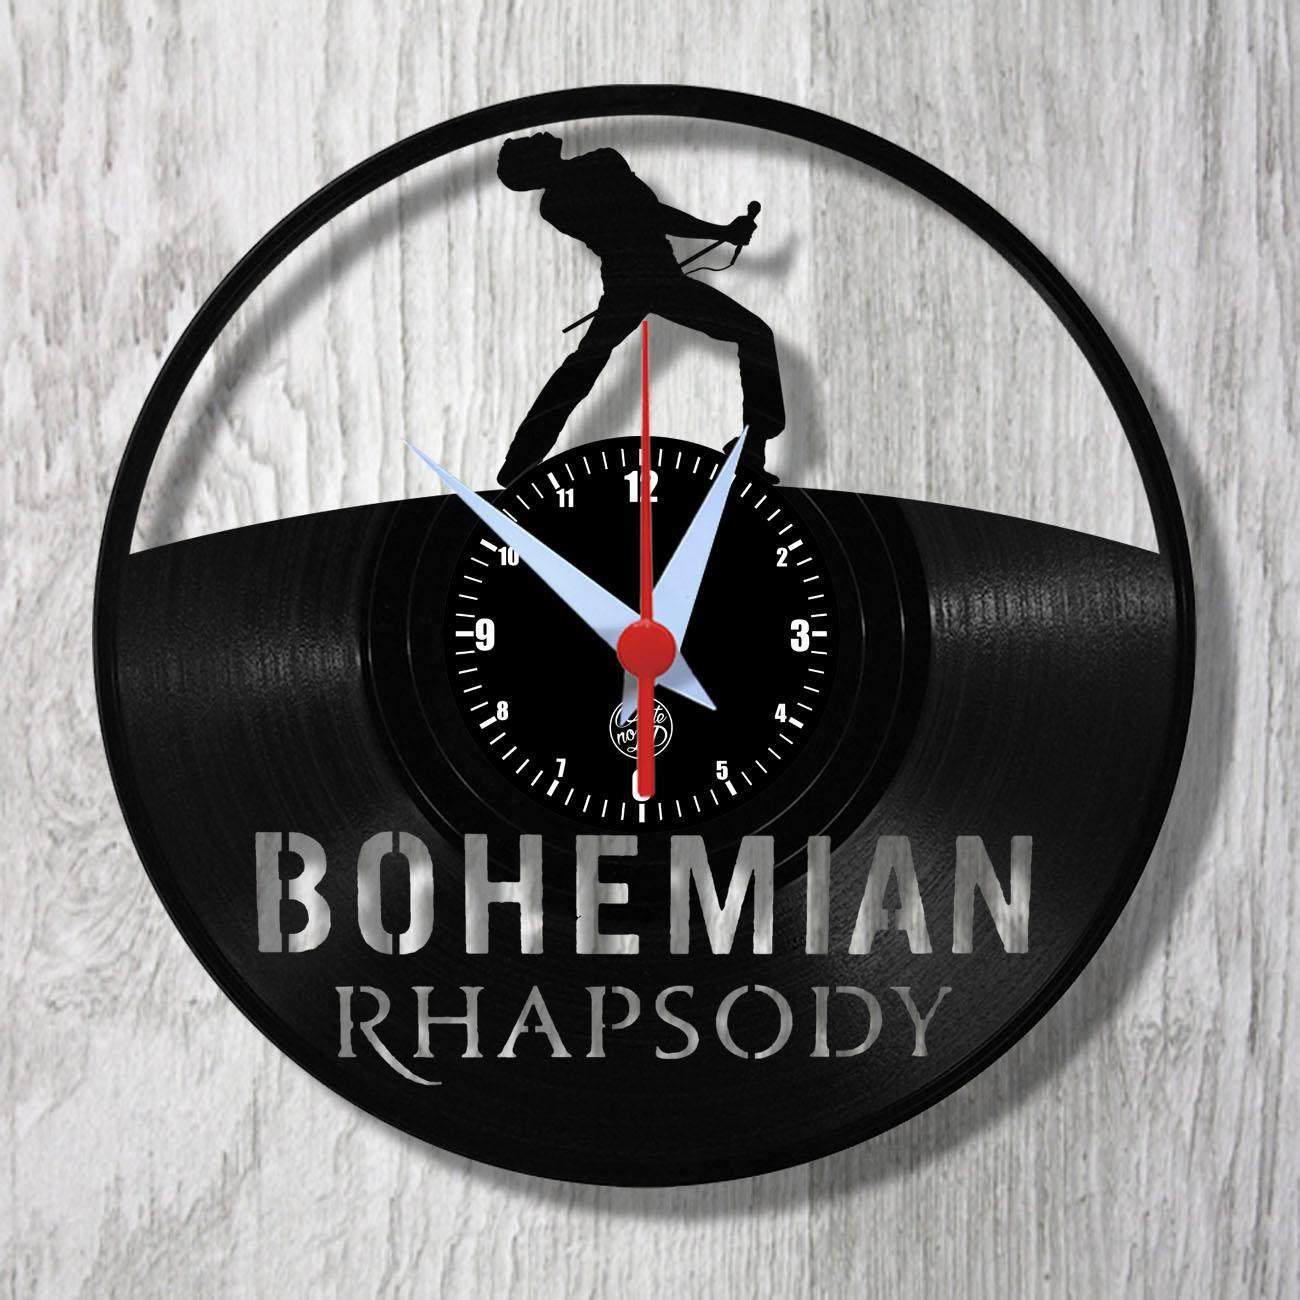 Relógio de Parede - Queen - Bohemian Rhapsody